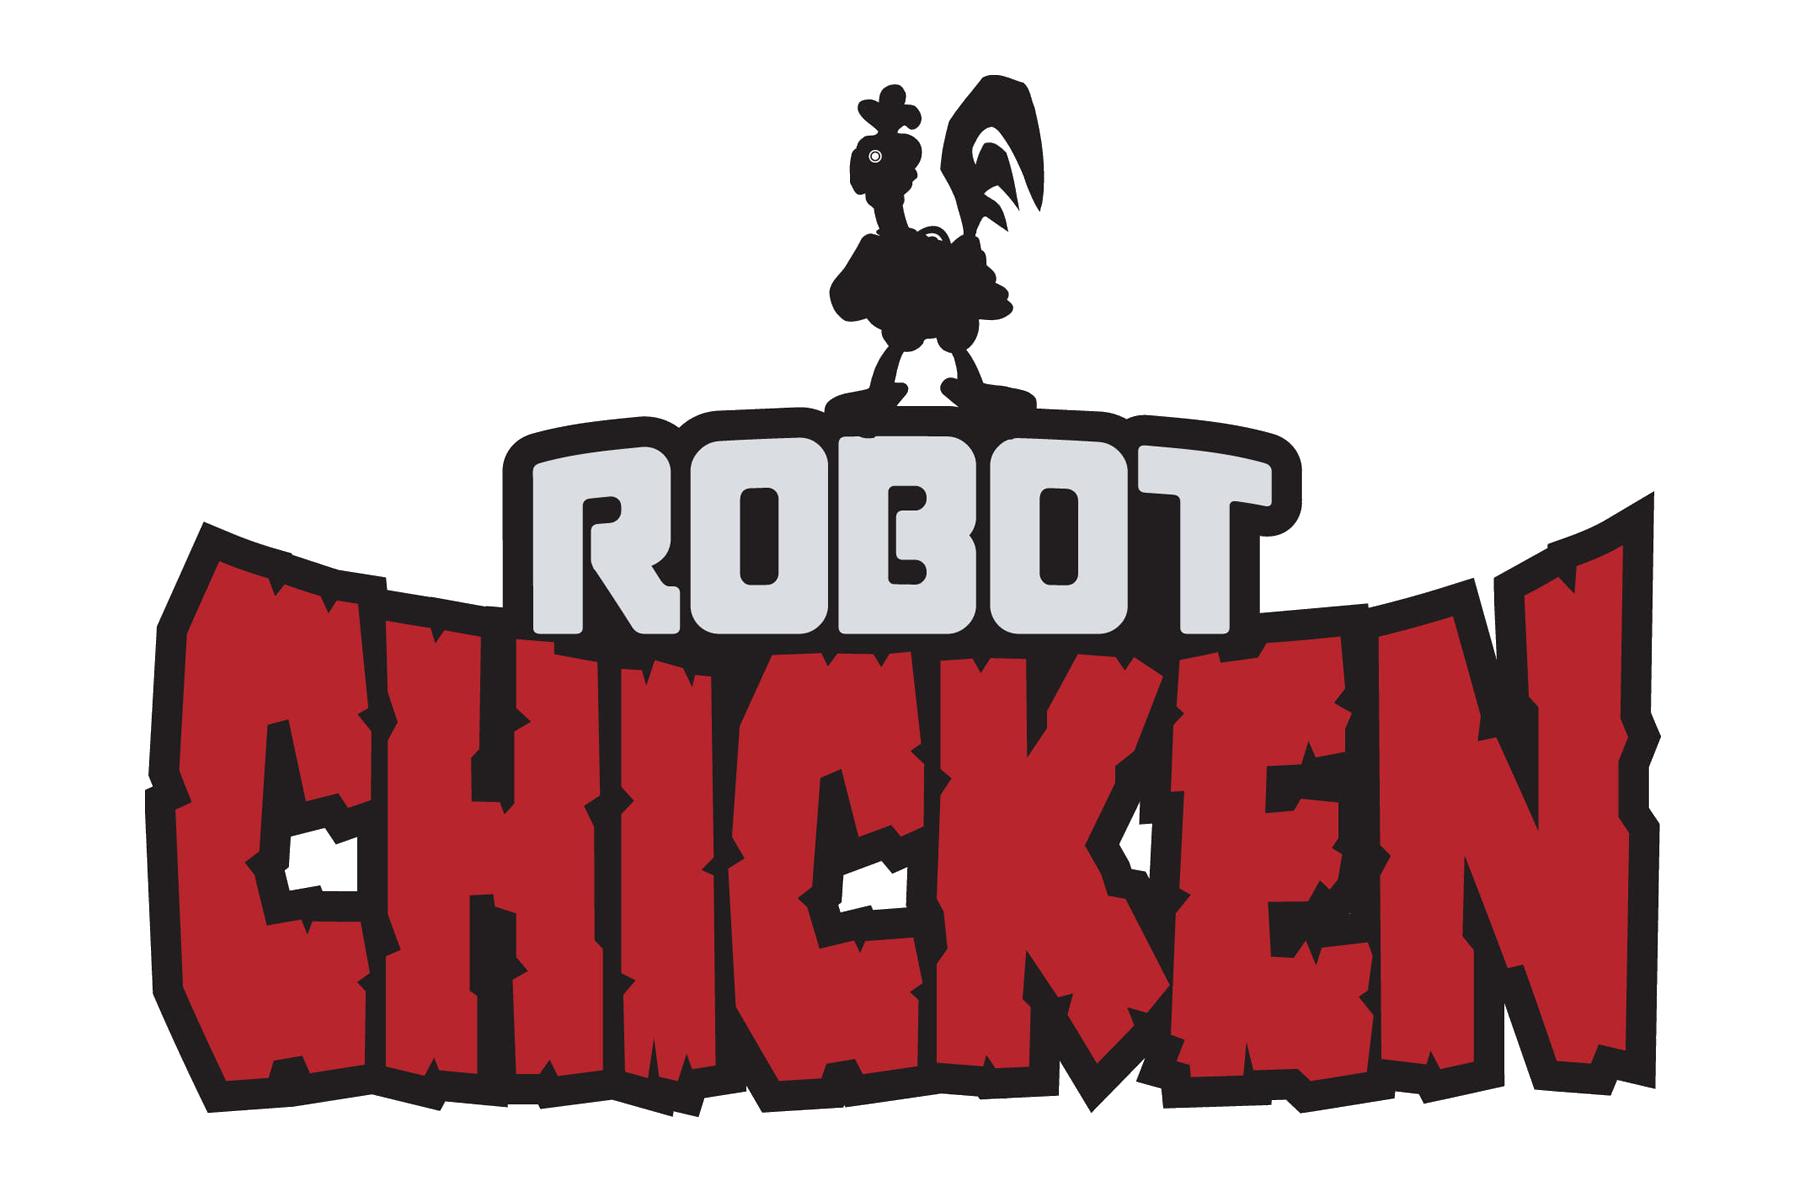 ROBOT CHICKEN LINK.png